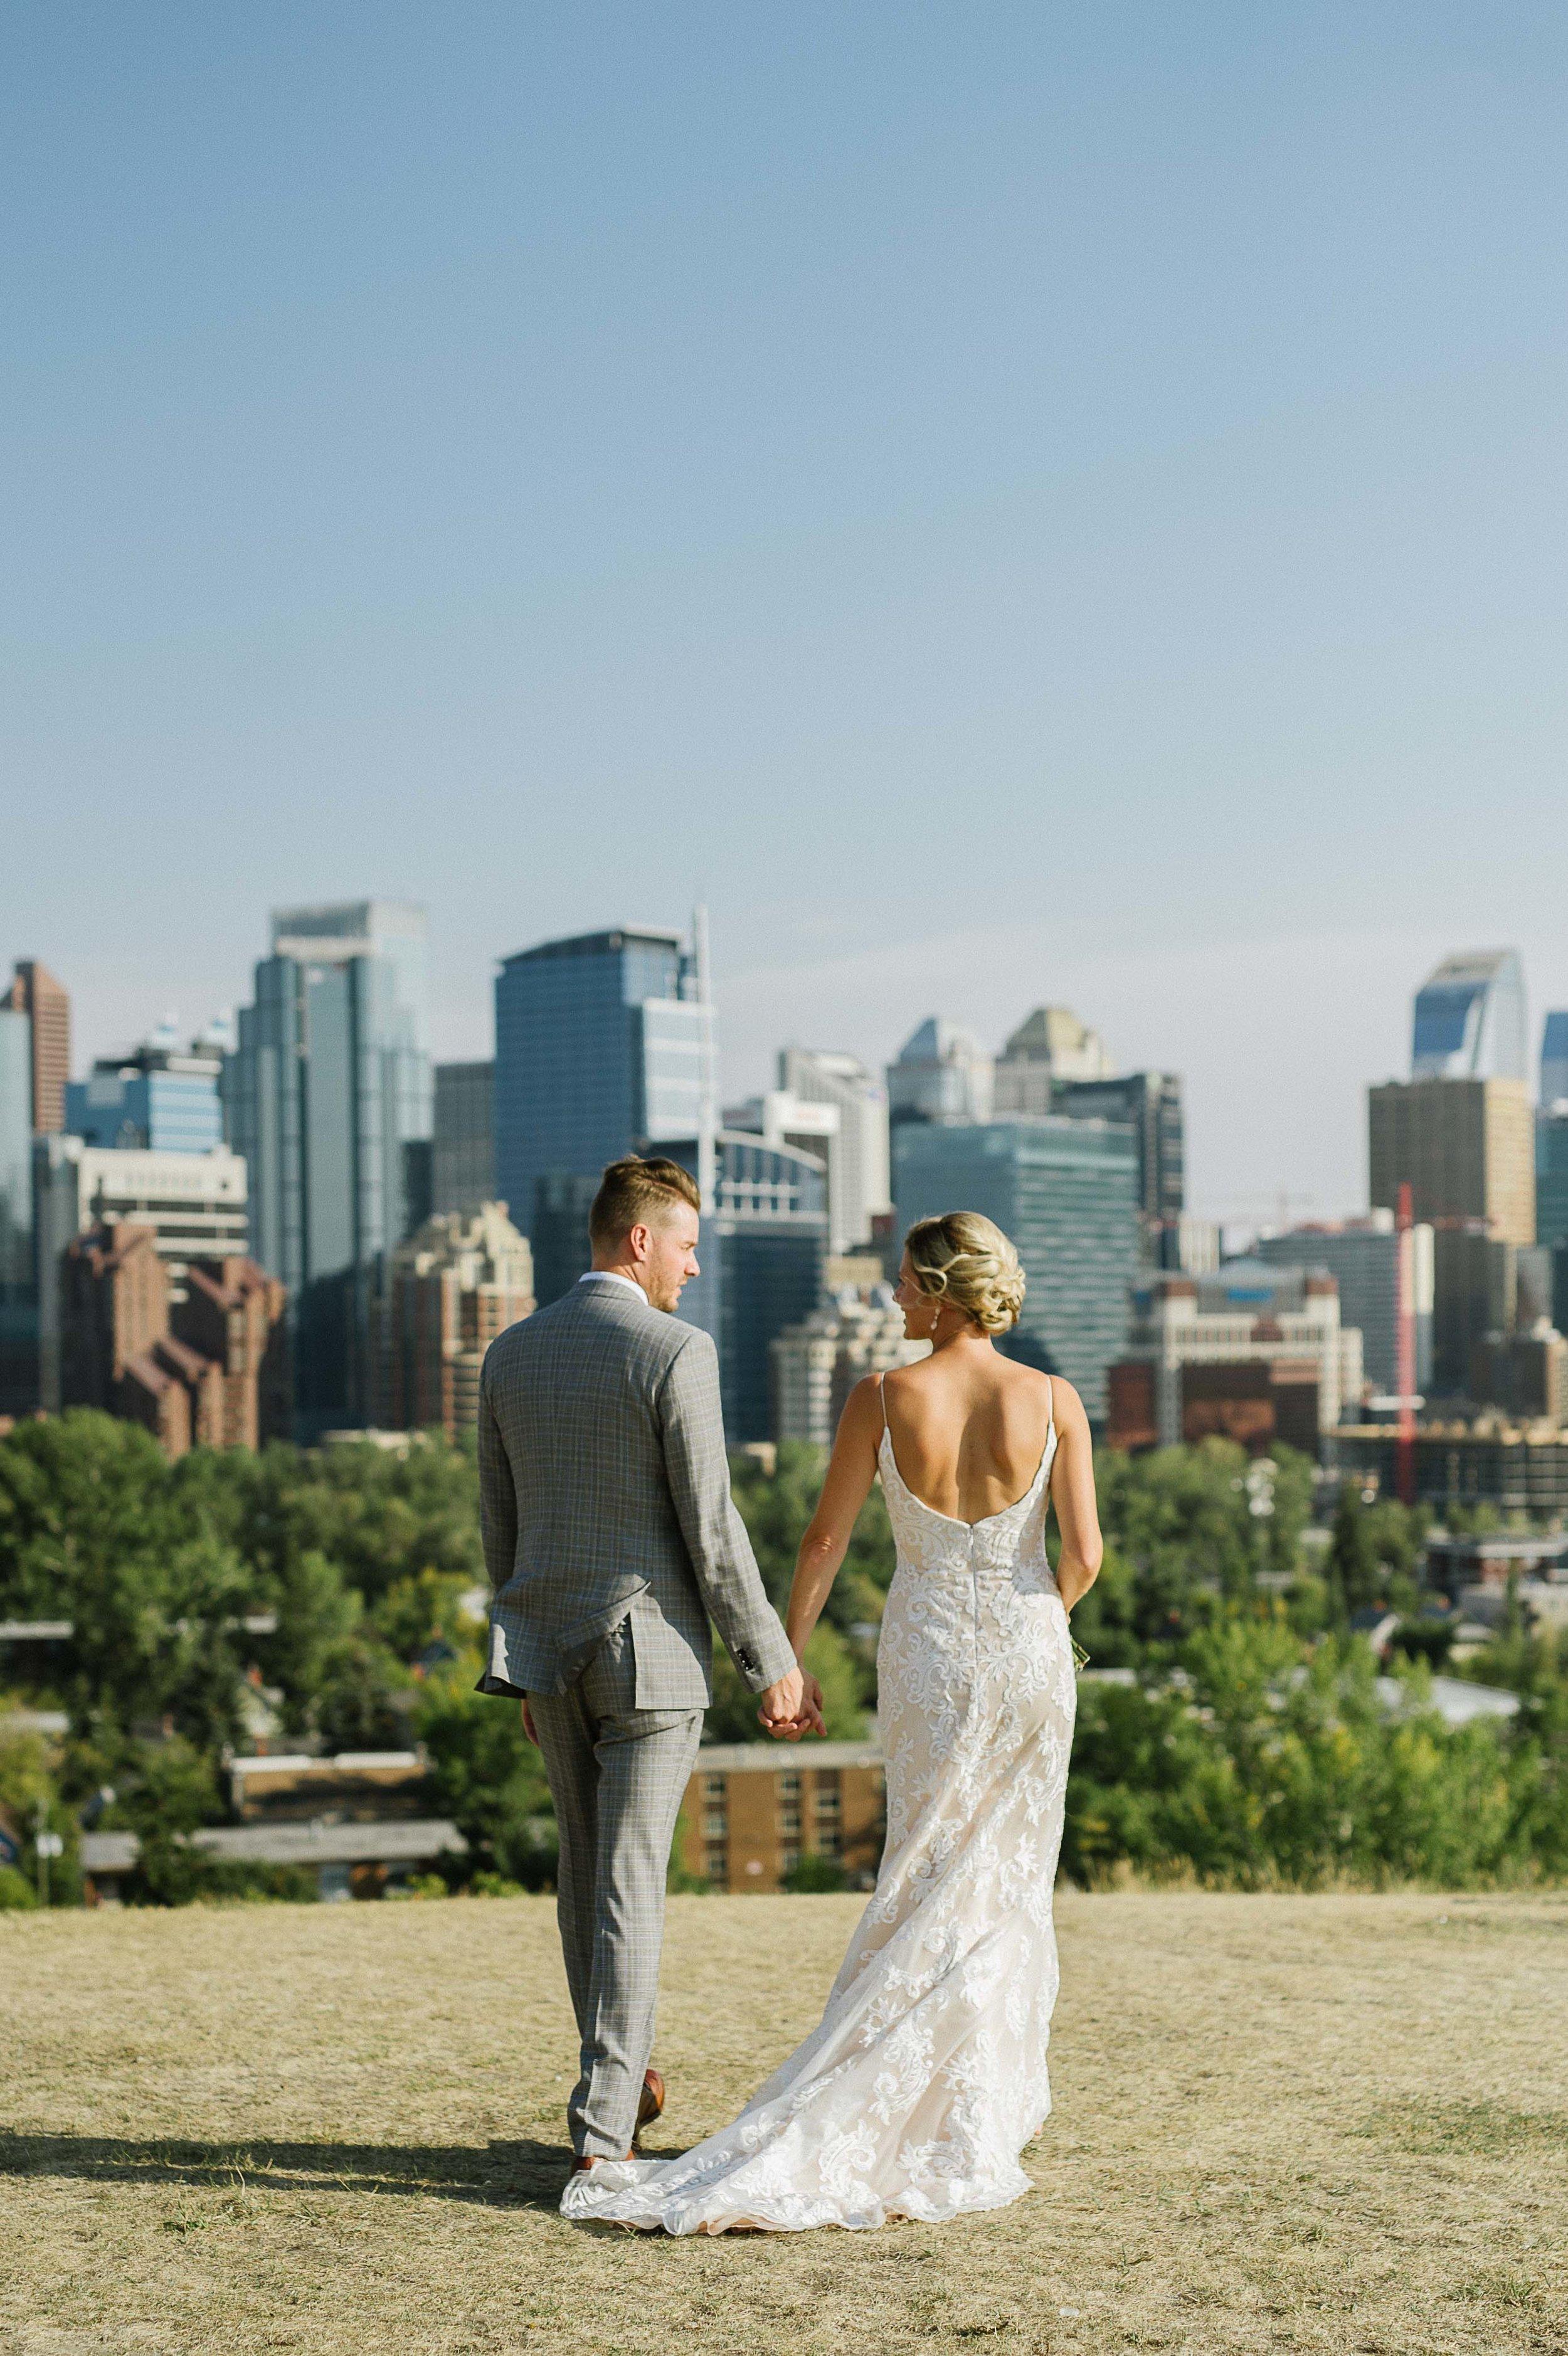 Christy-D-Swanberg-Photography-Calgary-wedding-elopement-22.jpg